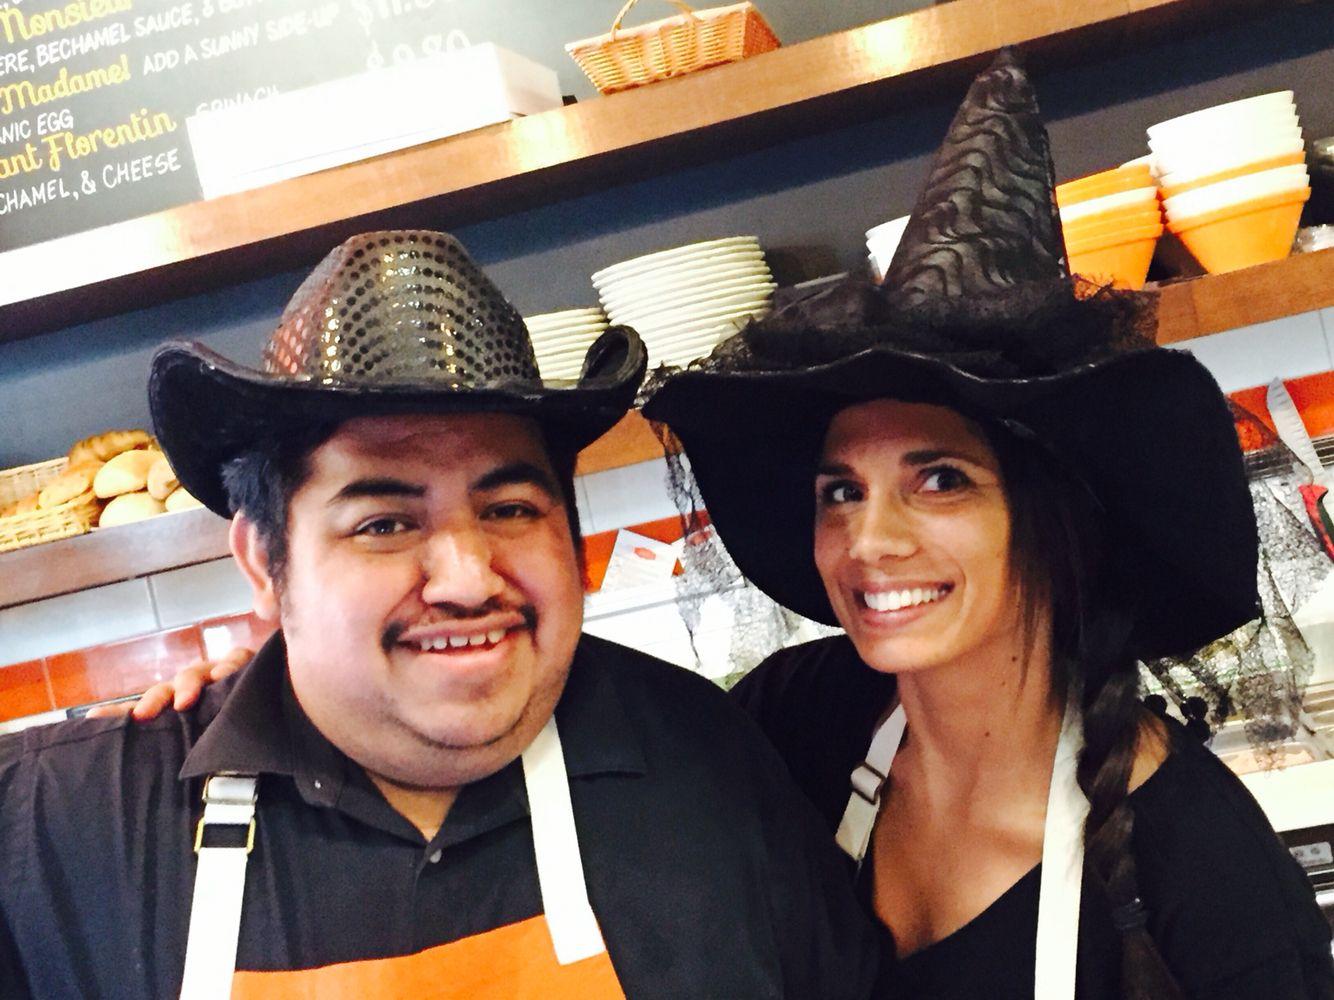 Friendly staff & lots of treats - Halloween @pitchoun